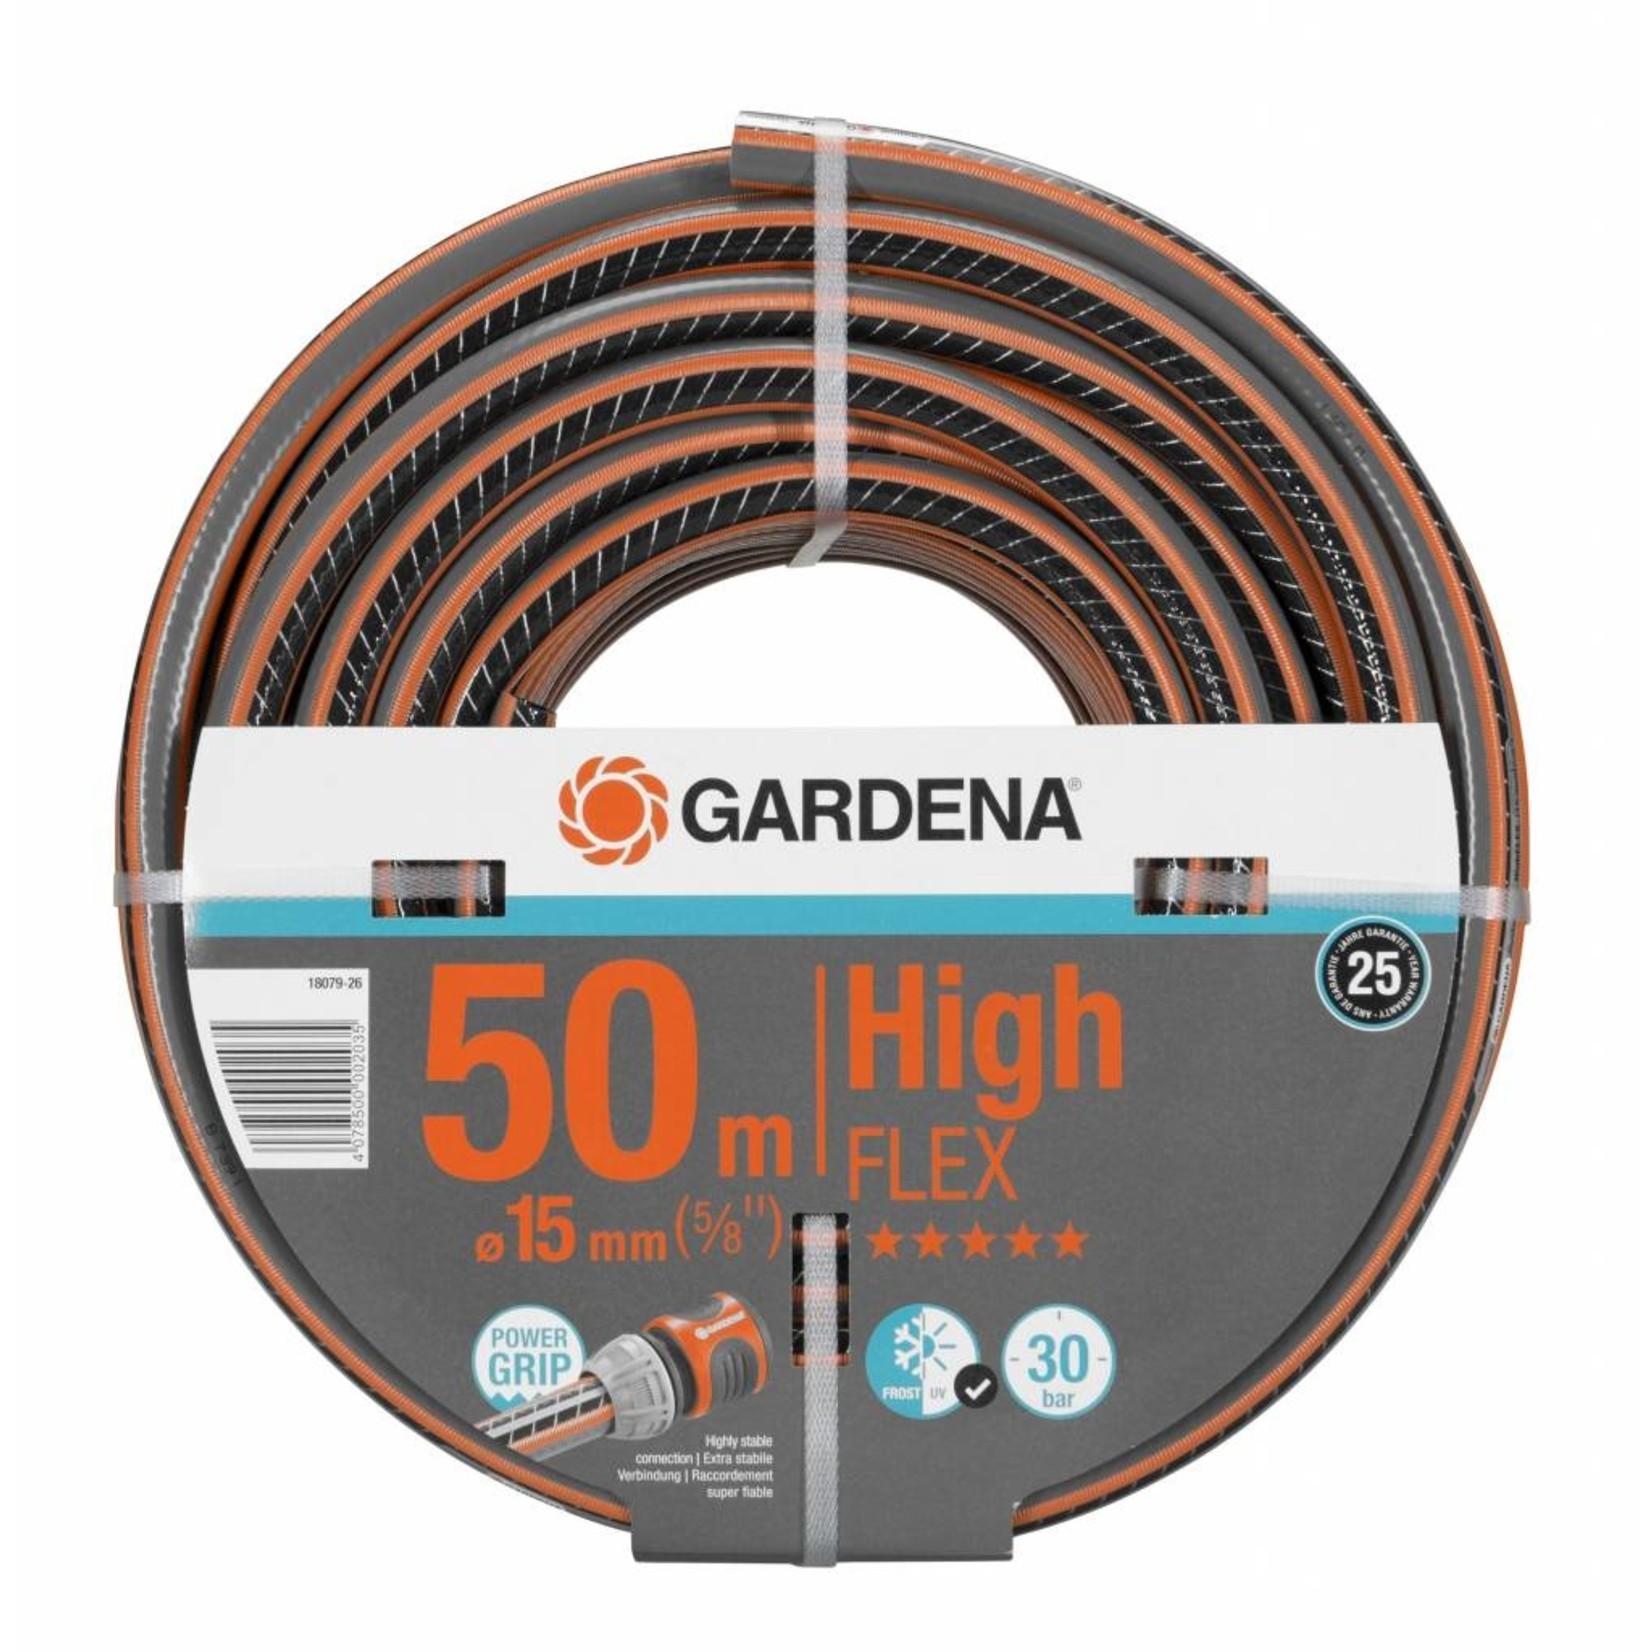 Gardena Gardena Comfort HighFLEX slang 50m/15mm